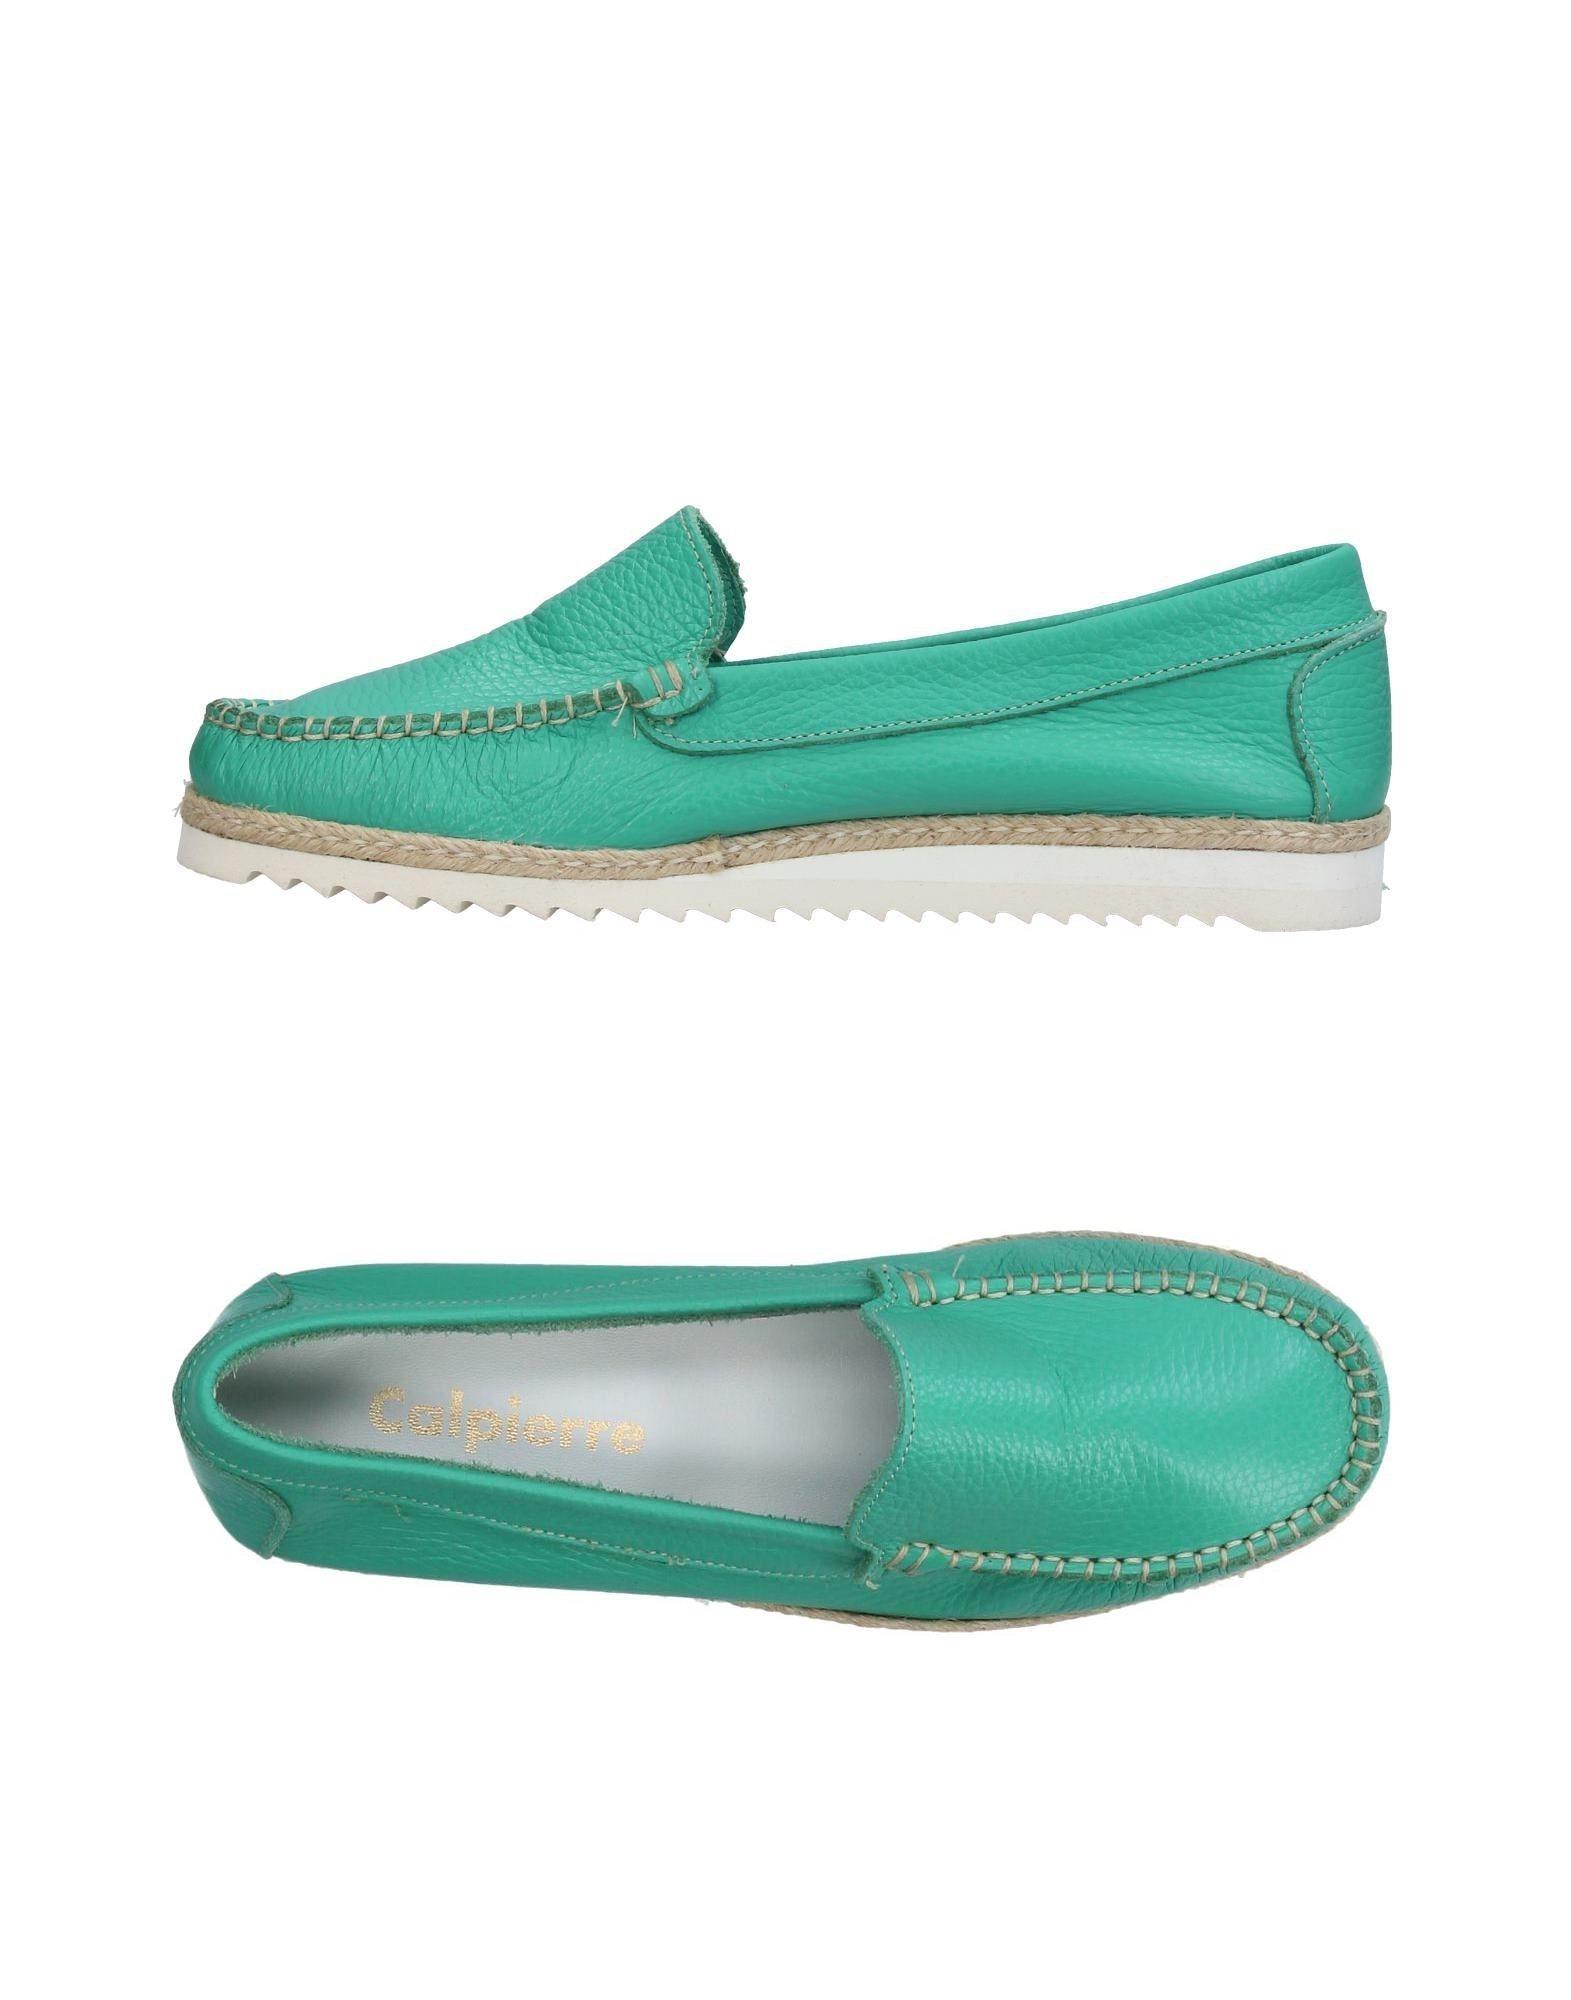 Calpierre Mokassins Damen  11407562SU Gute Qualität beliebte Schuhe